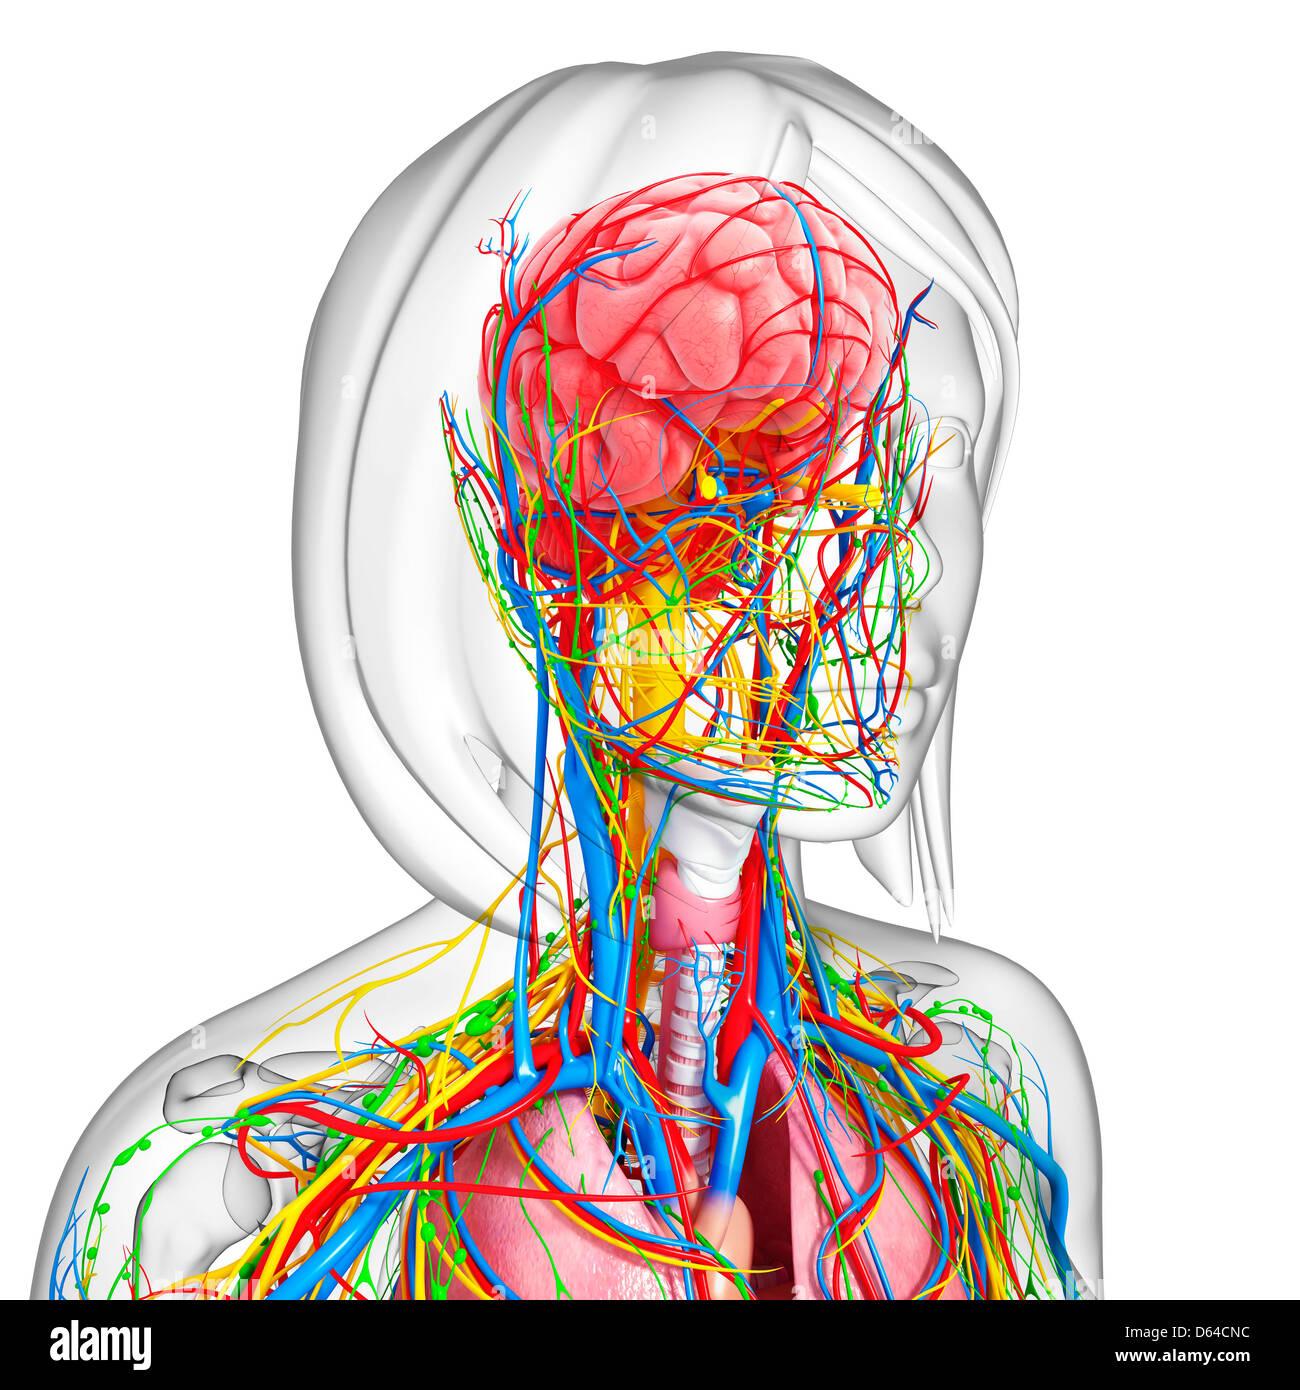 Nerve Supply Stockfotos & Nerve Supply Bilder - Alamy